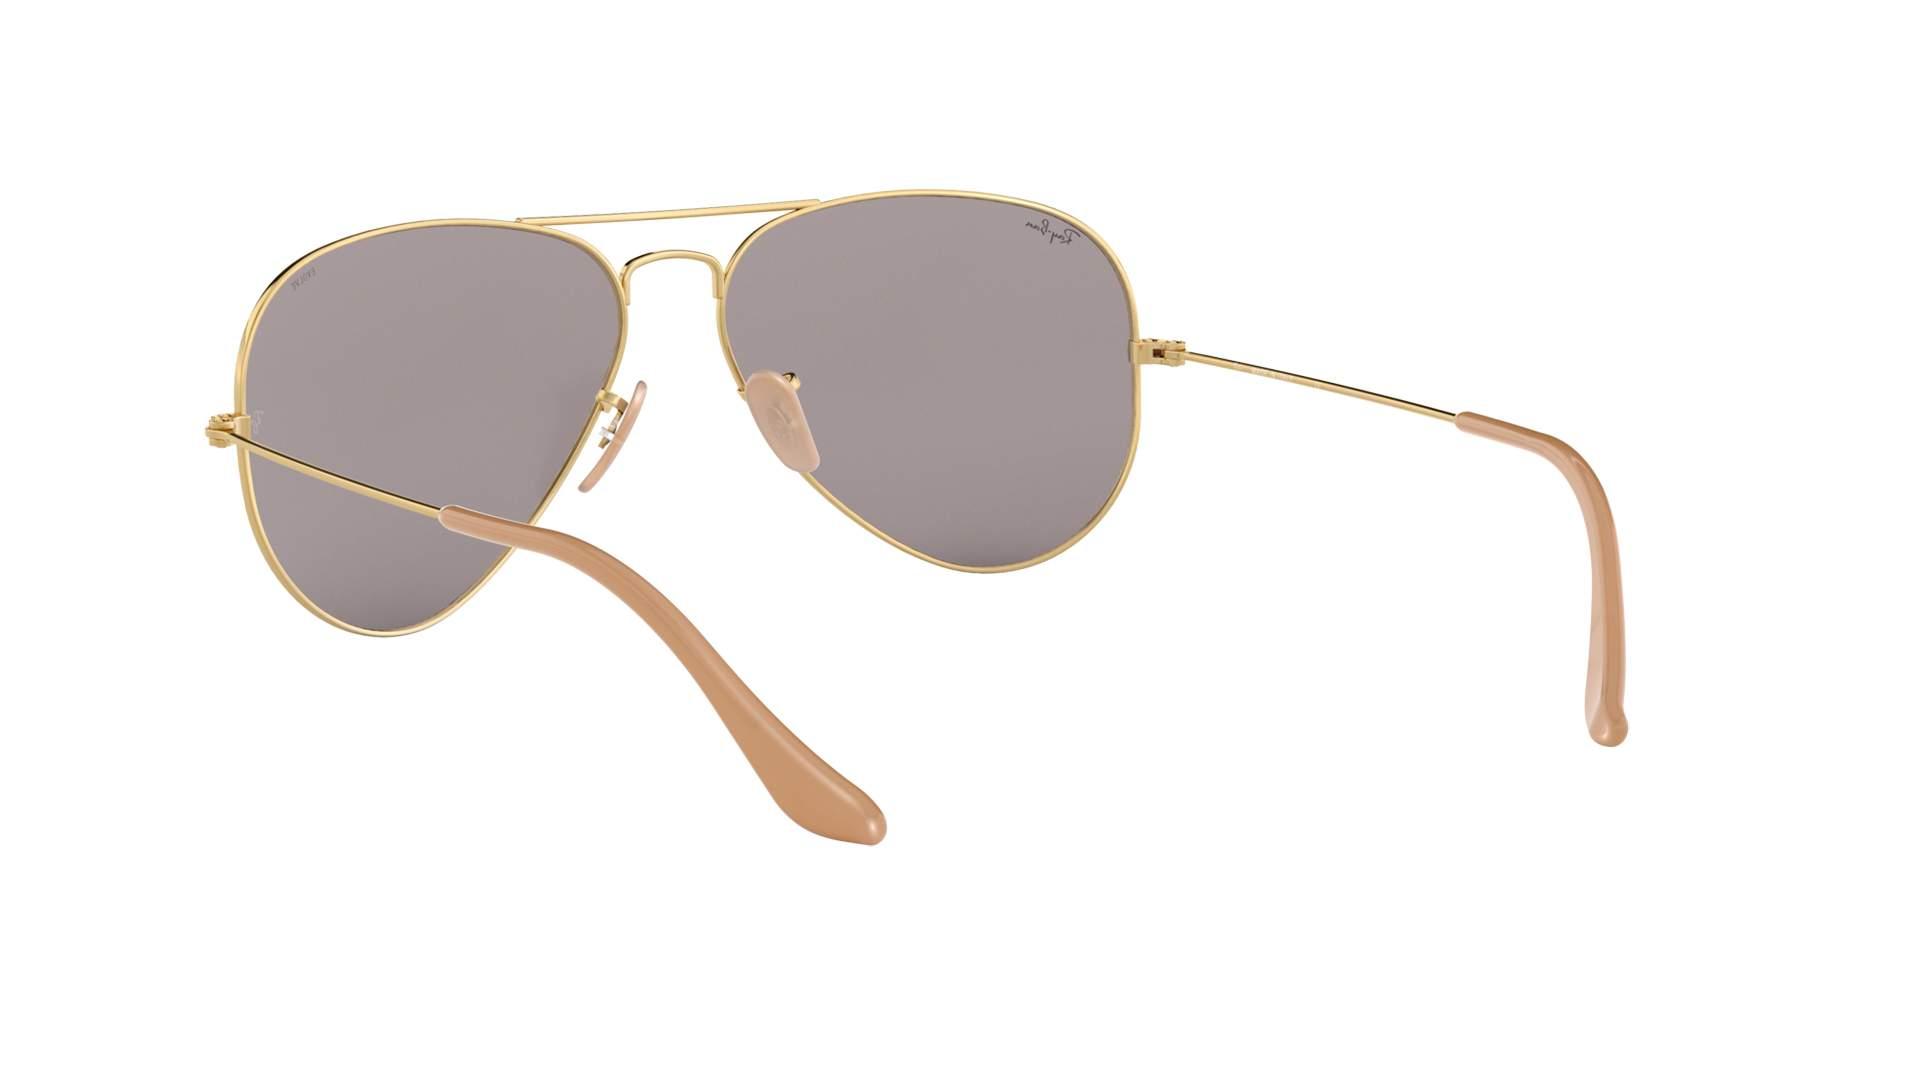 25599985e Sunglasses Ray-Ban Aviator Evolve Gold RB3025 9064/V8 58-14 Medium  Photochromic. Small. 55-14